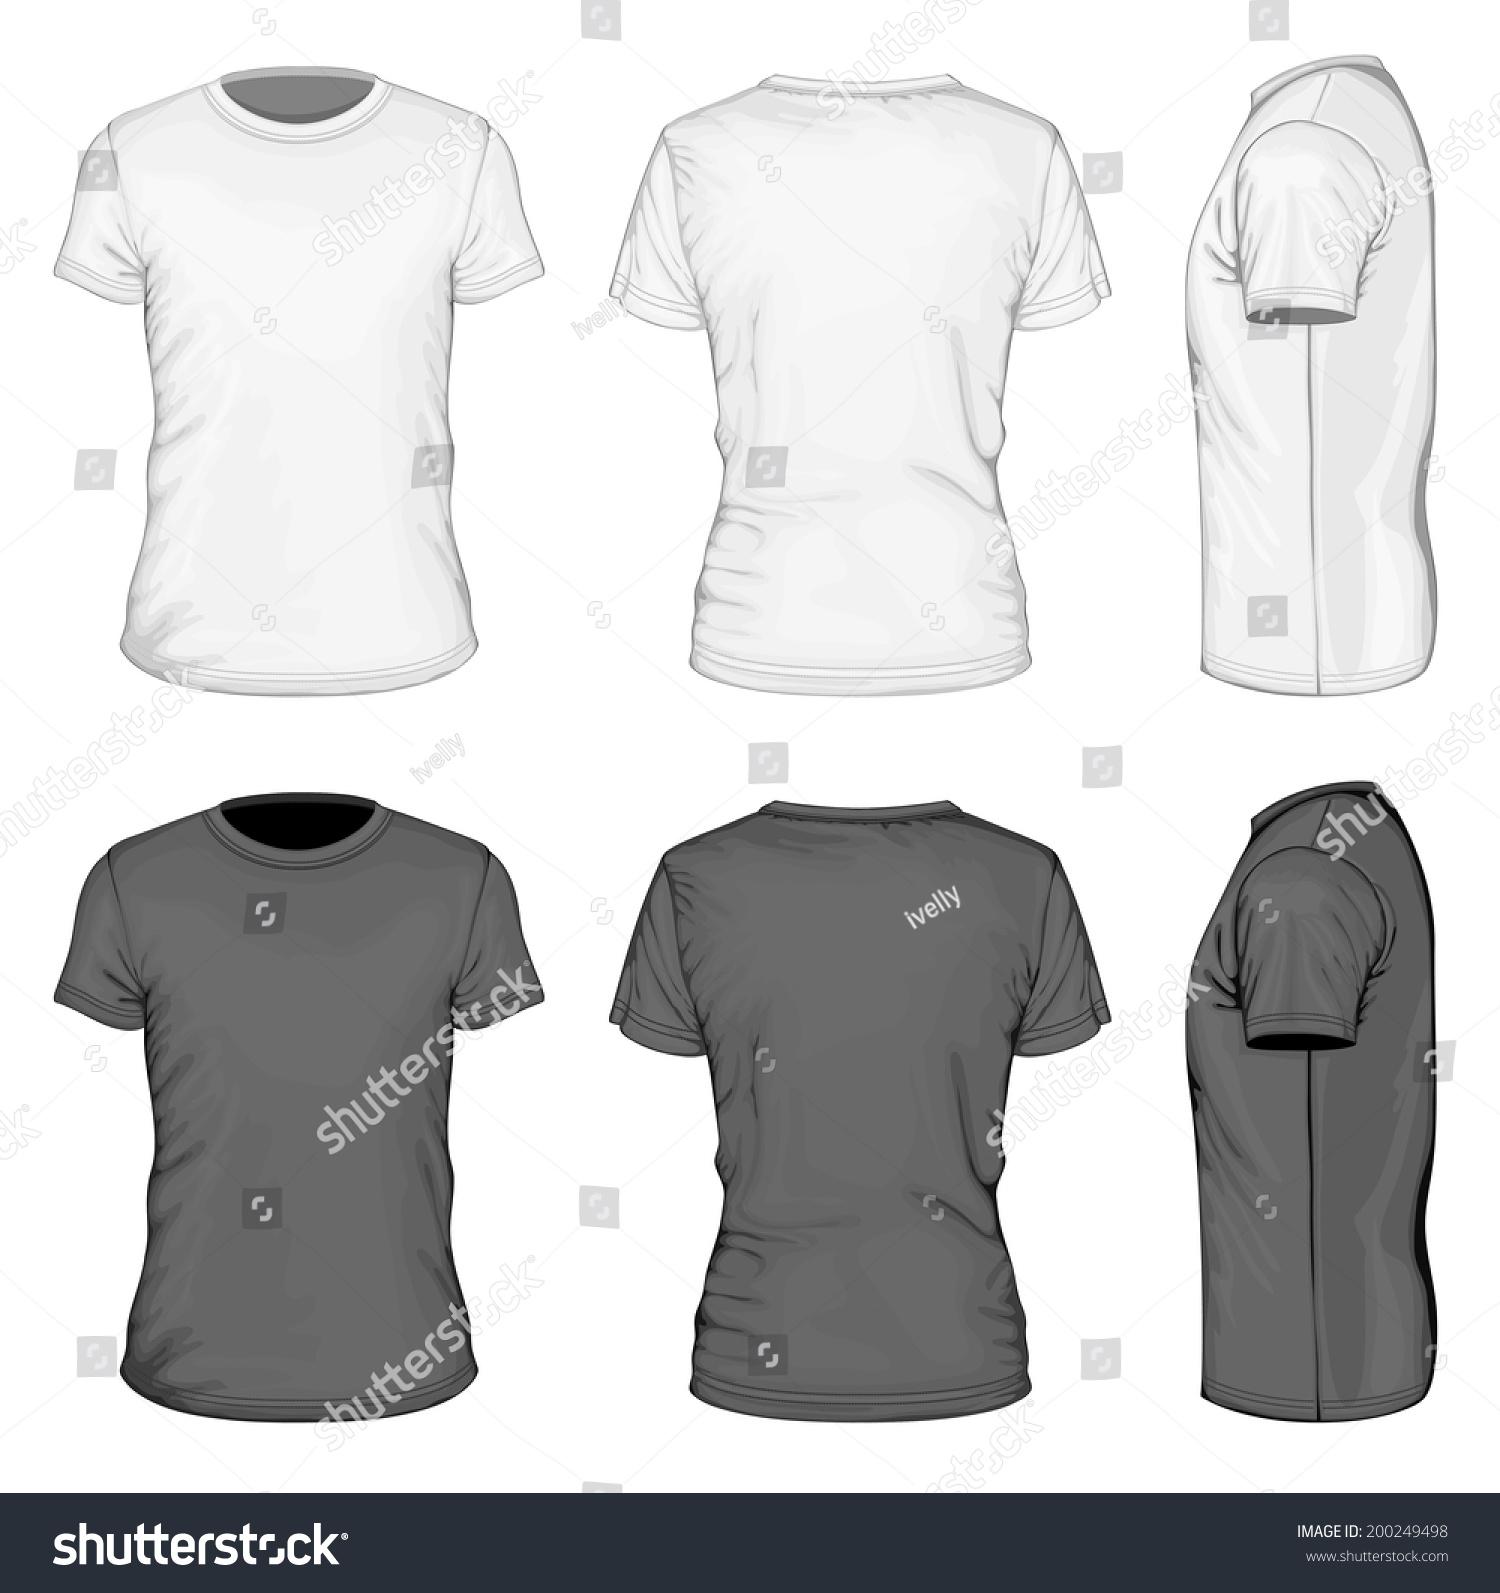 Black t shirt front and back plain - Black T Shirt Front And Back Plain T Shirt Outline Image Black T Shirt Front